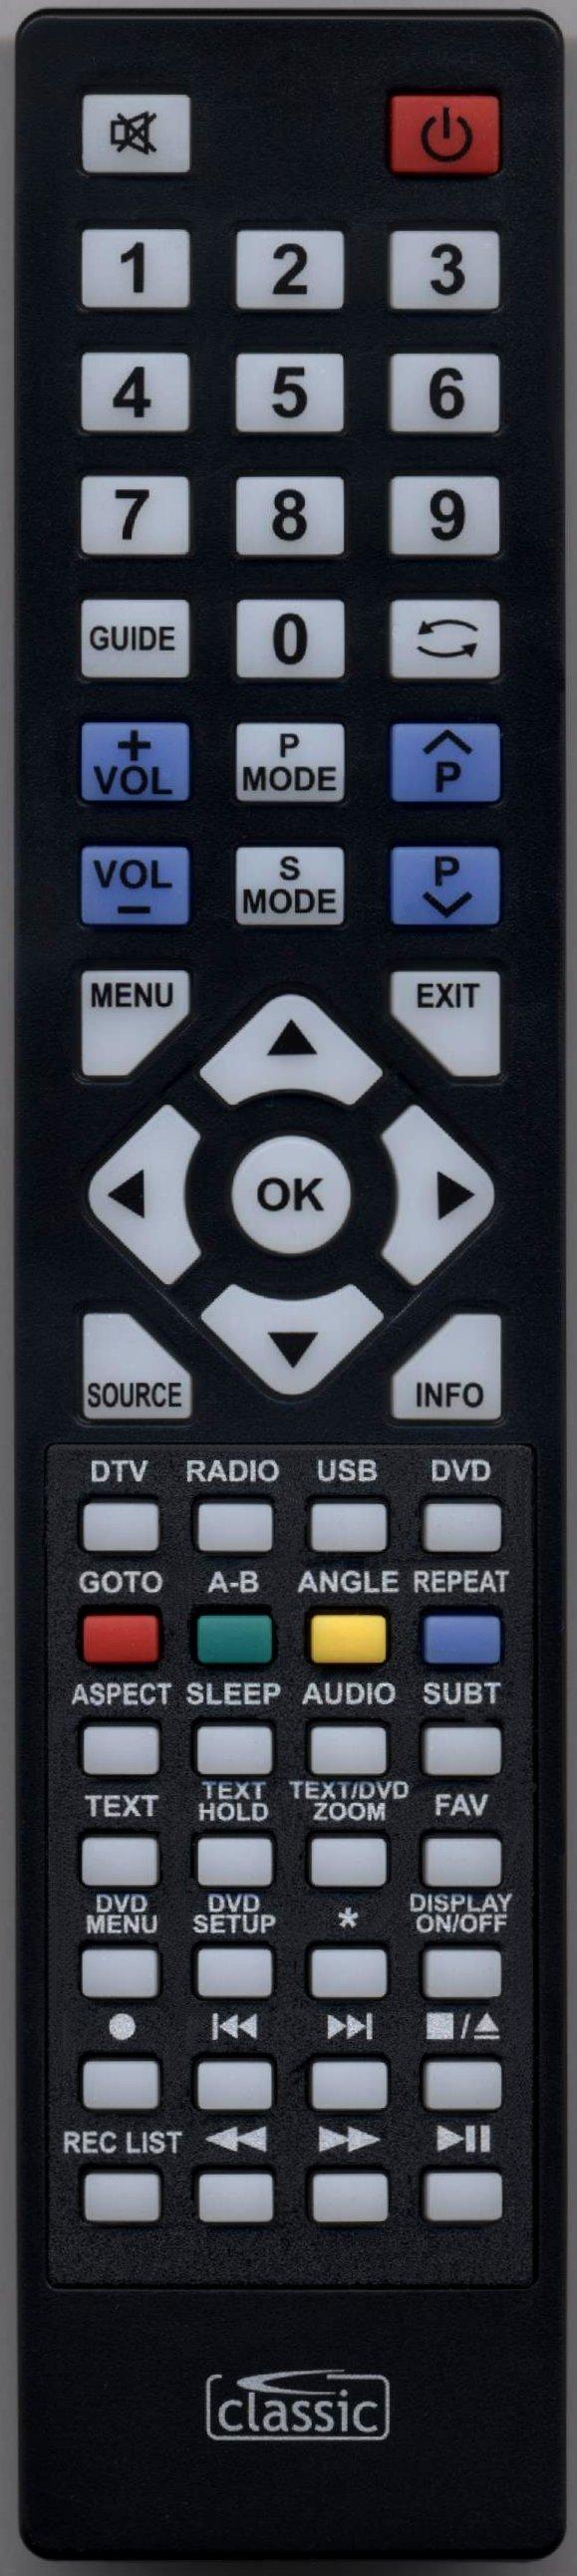 BLAUPUNKT 32/133I-WB-5B2-HKUP-UK Remote Control Alternative